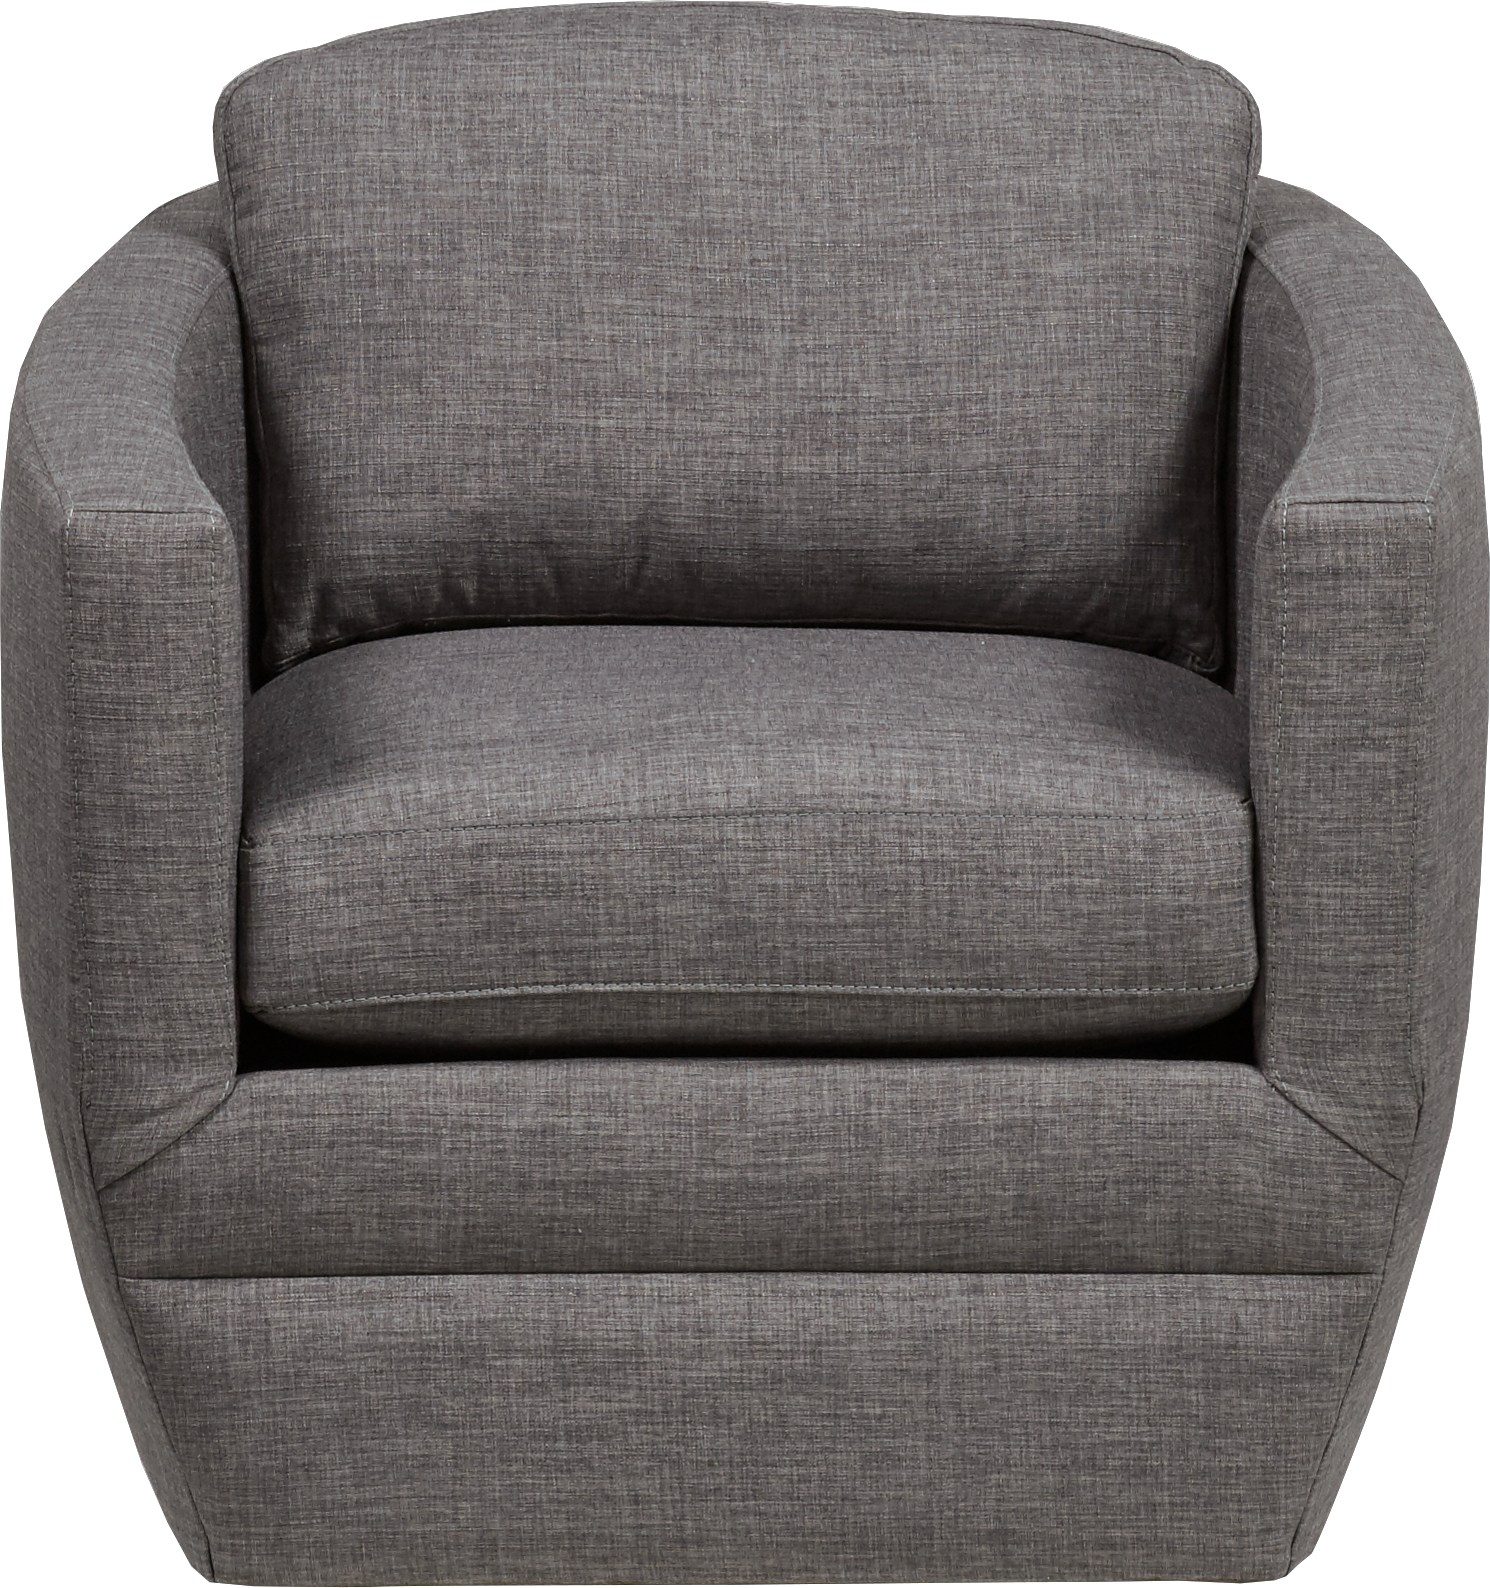 Harbour City San Marino Dark Gray Swivel Chair – Chairs (Gray) In Dark Grey Swivel Chairs (Image 8 of 20)